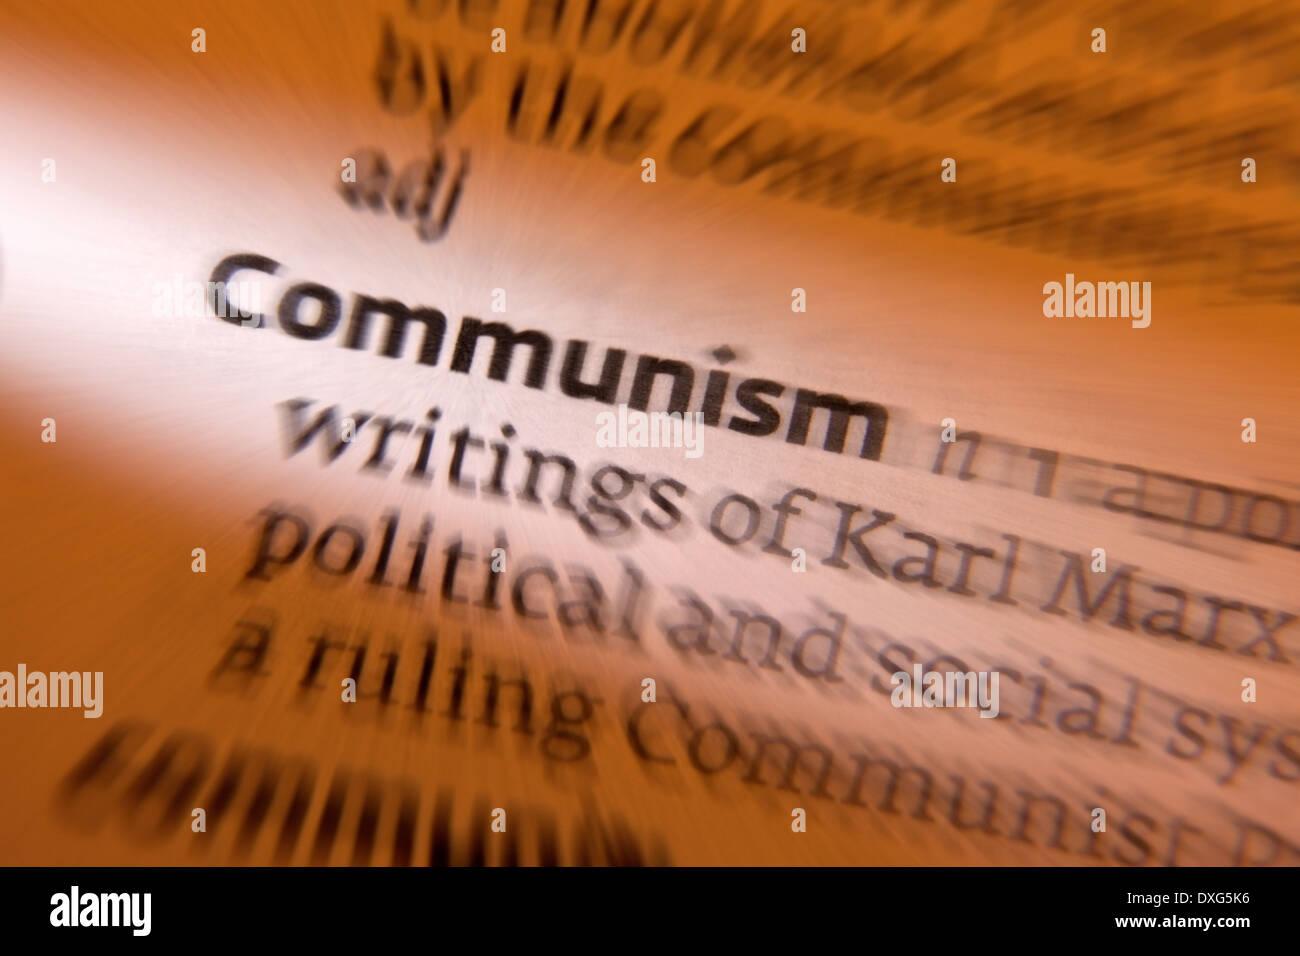 Communism - Stock Image